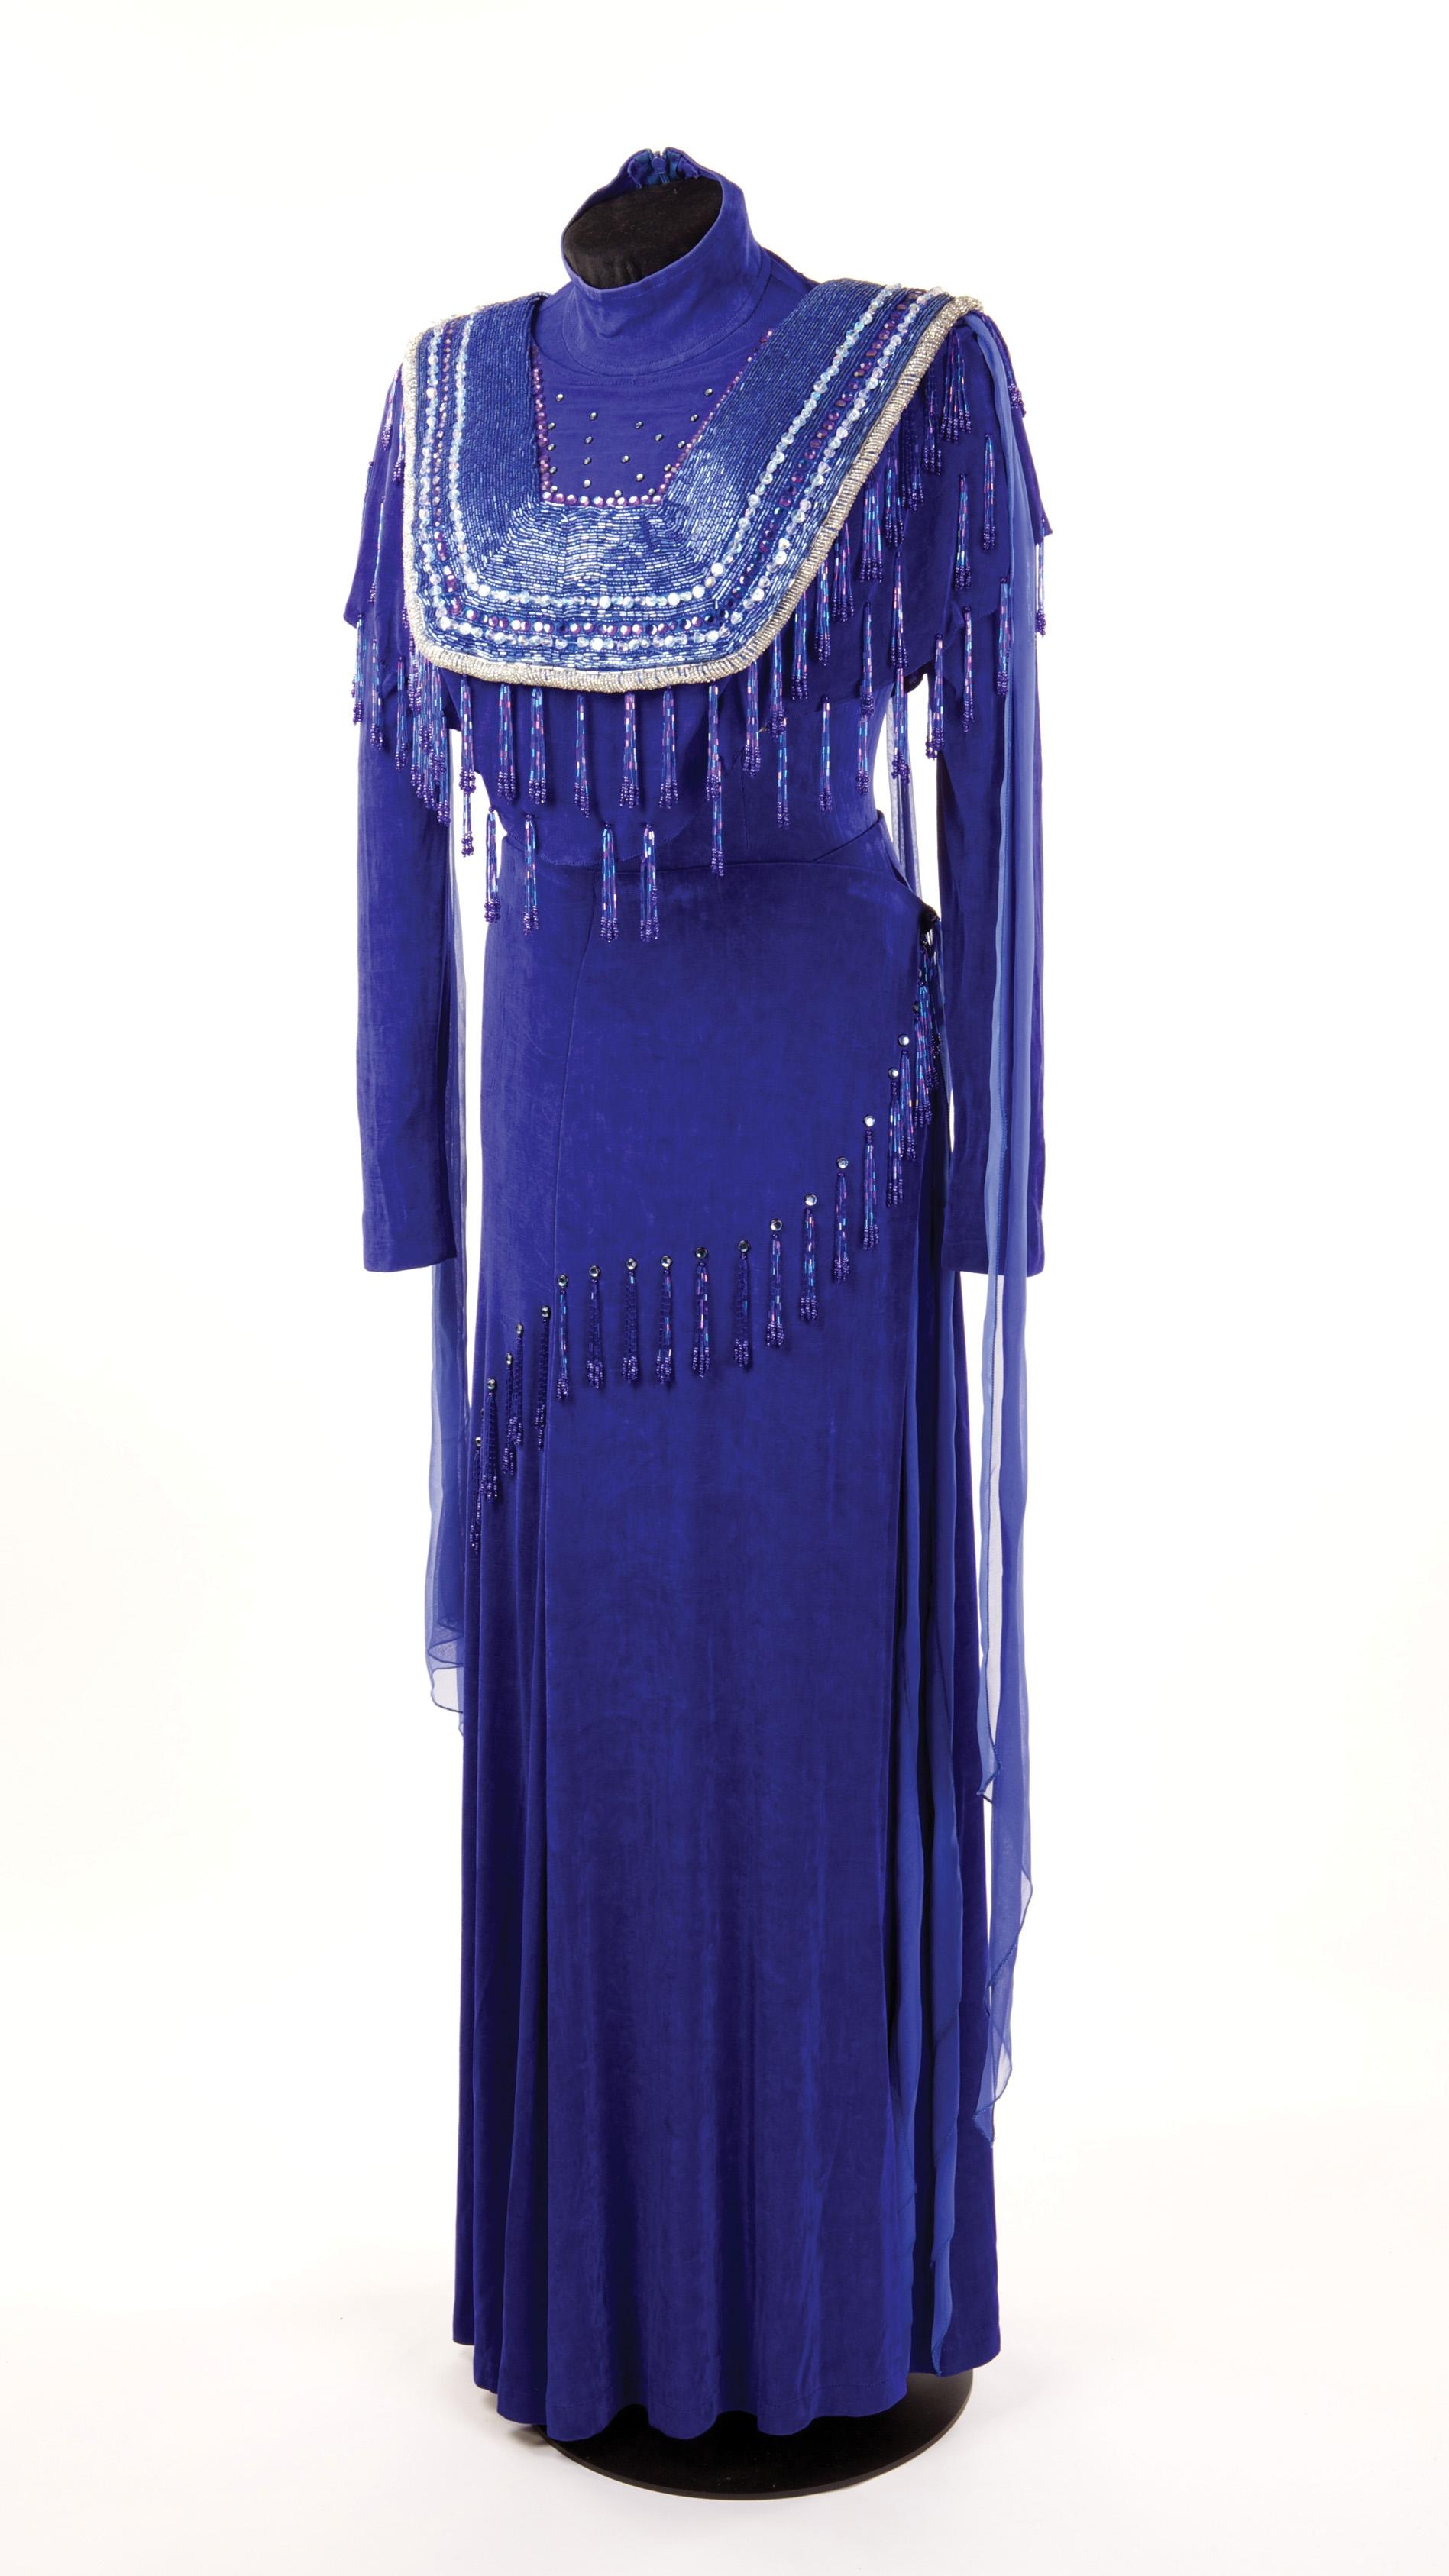 Blue Bead Dress.jpg